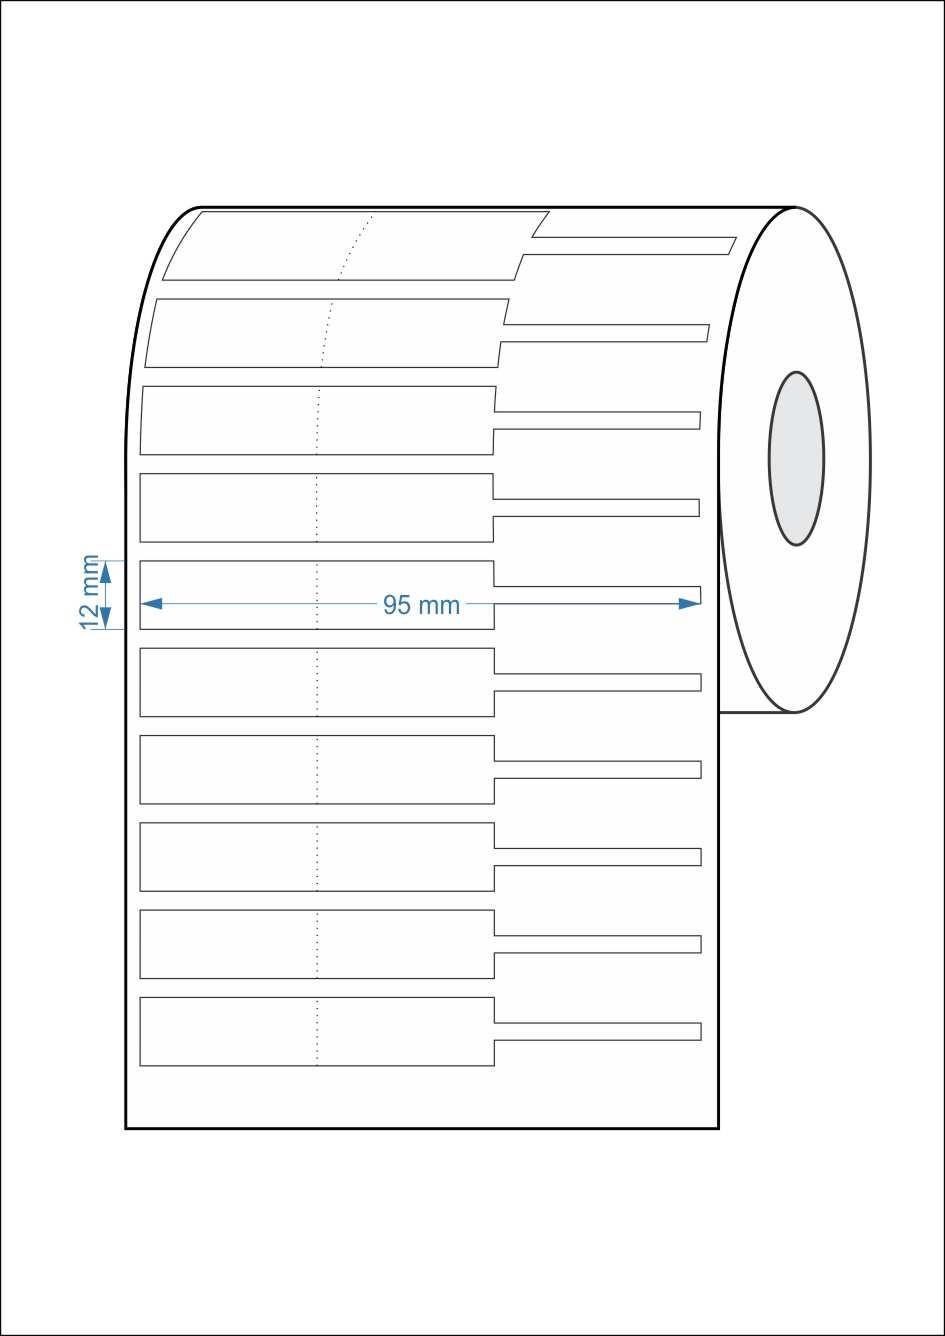 Etiquetas Adesivas para Joias e Otica Bopp 95mx12mm 2000un - 5 Rolos